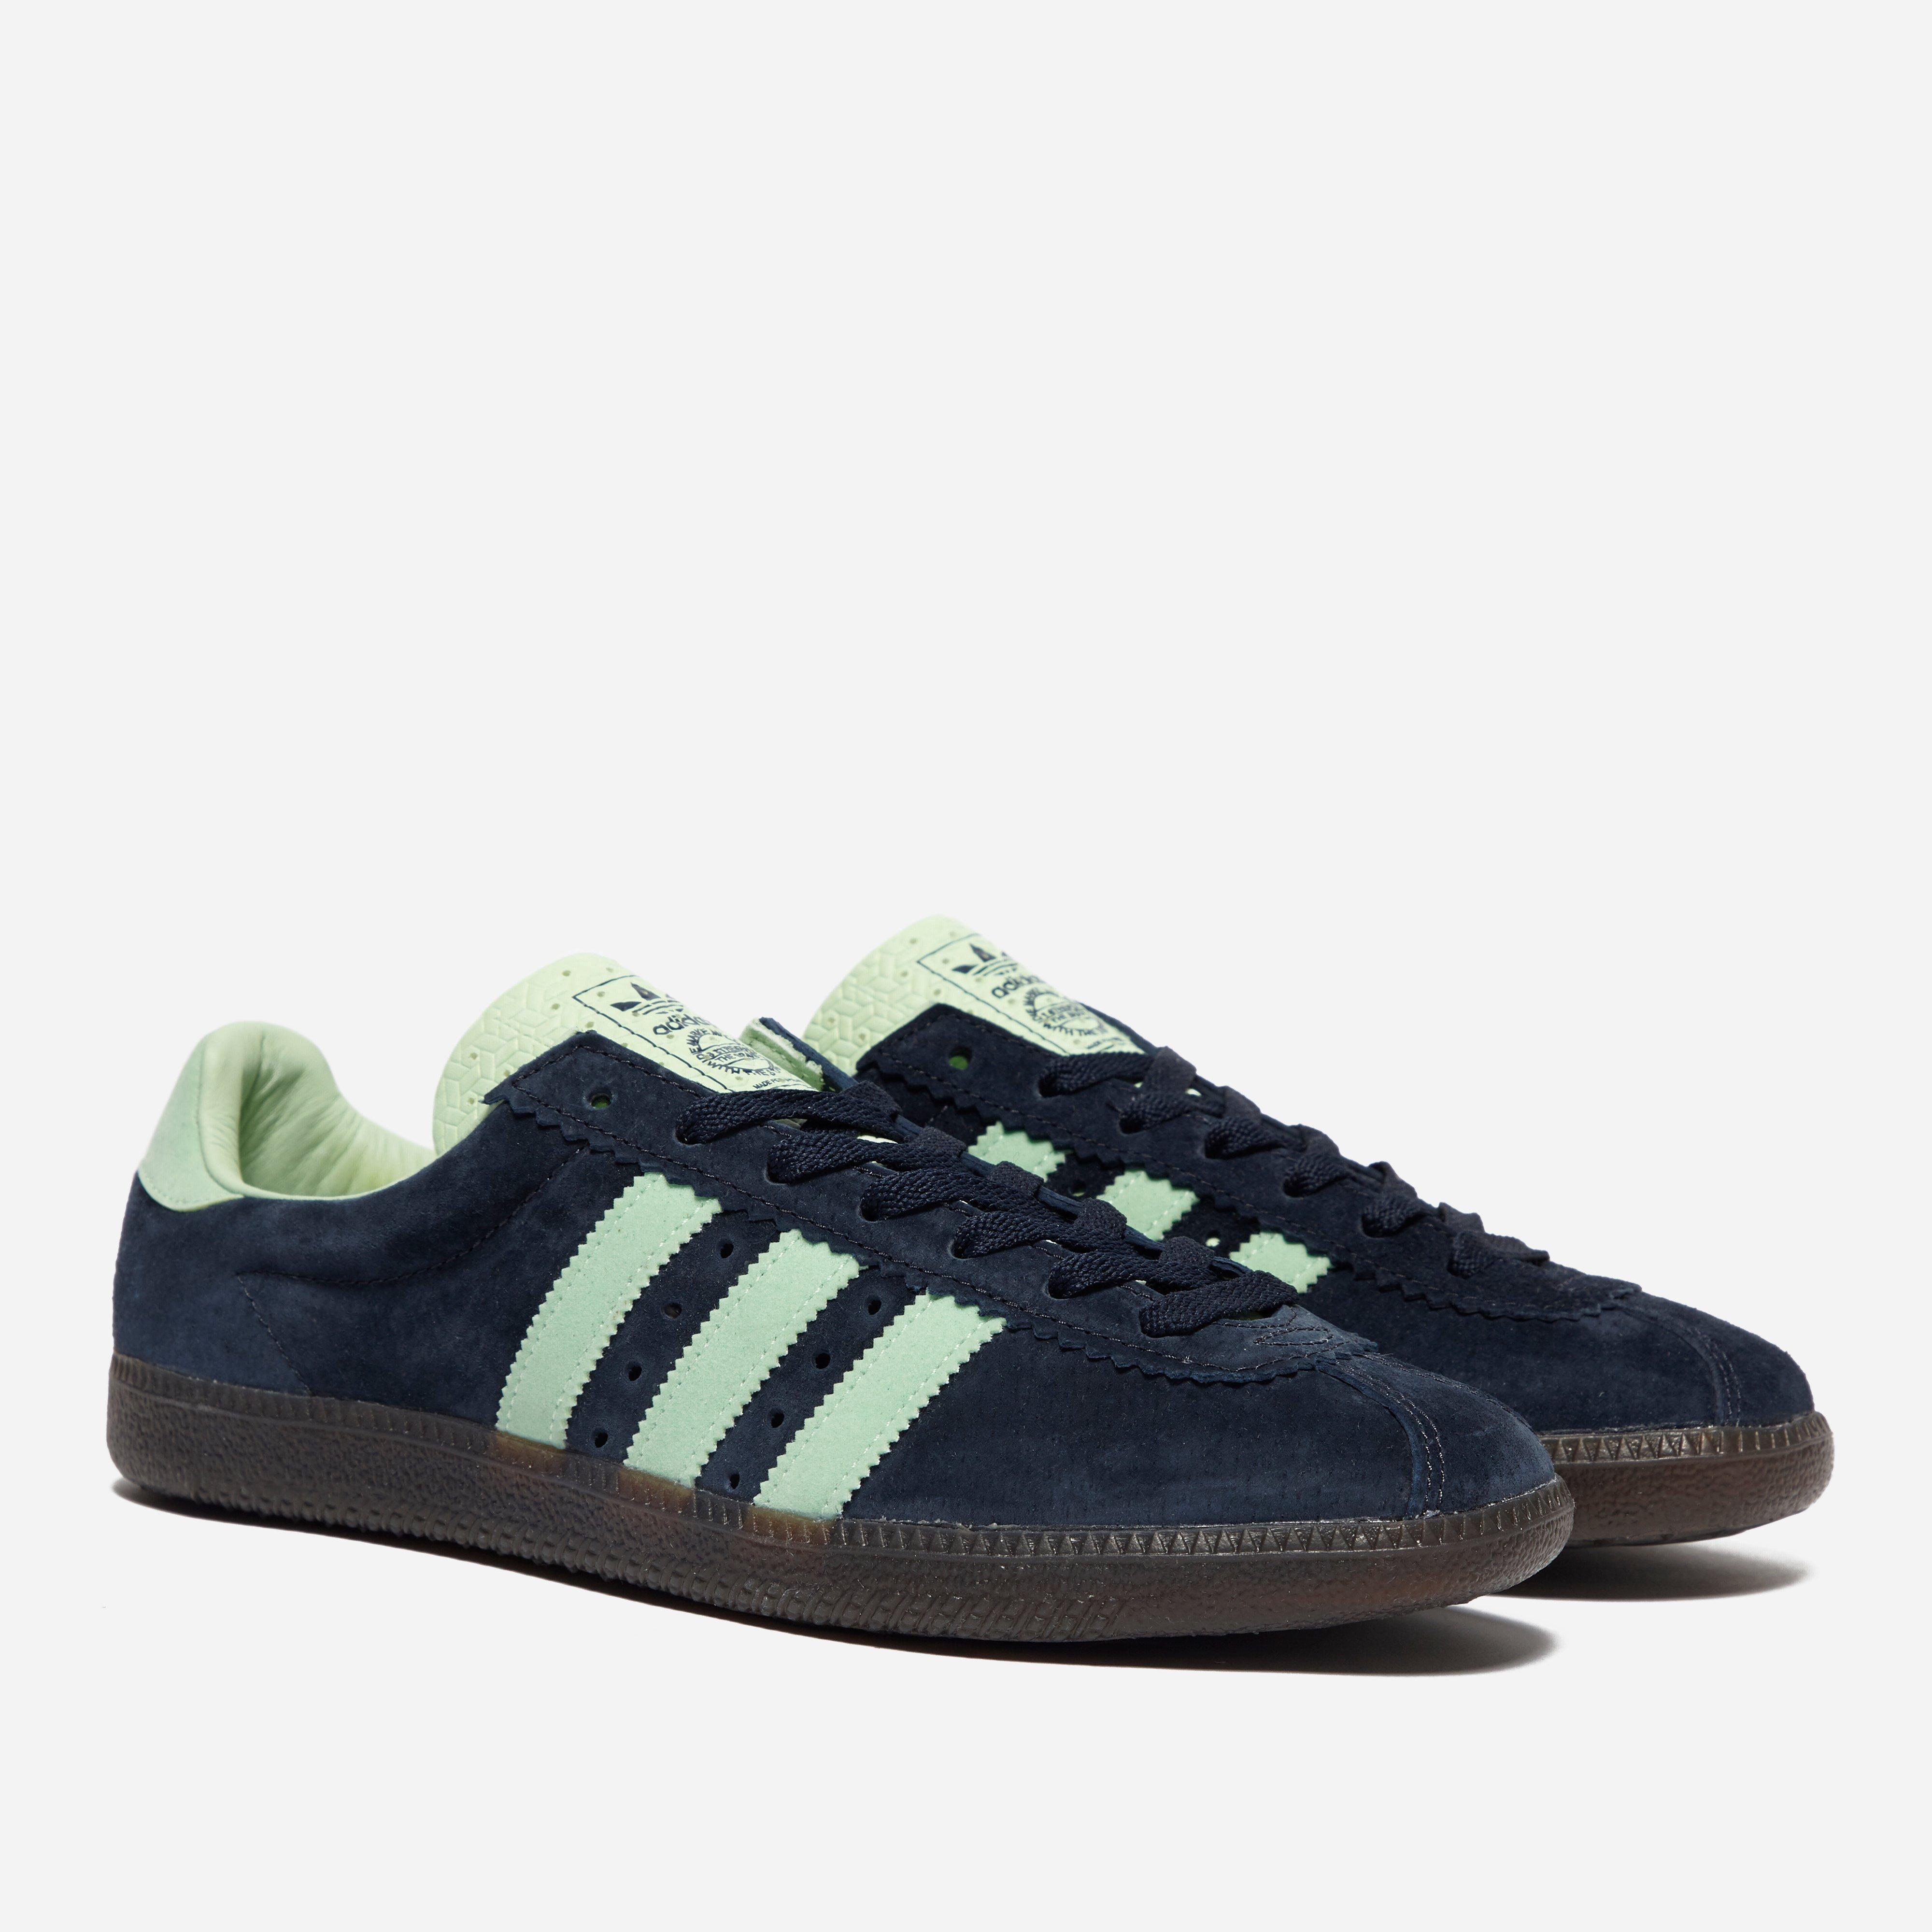 Lyst adidas Originals Adidas Originals Padiham spzl en azul para los hombres